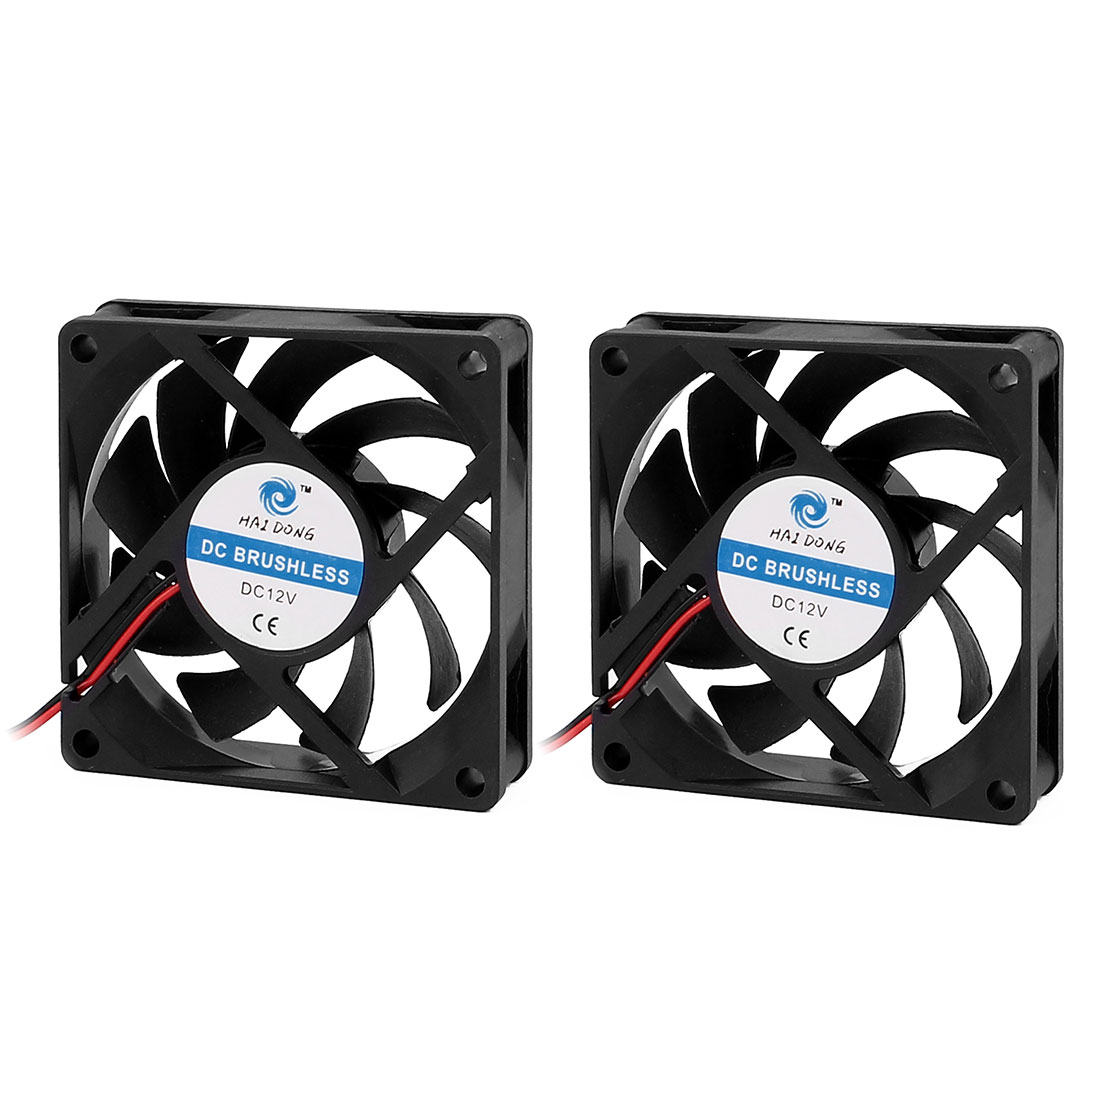 70 x 70 x 15mm DC 12V 0.16A Radiator Cooling Fan Case Cooler for Computer